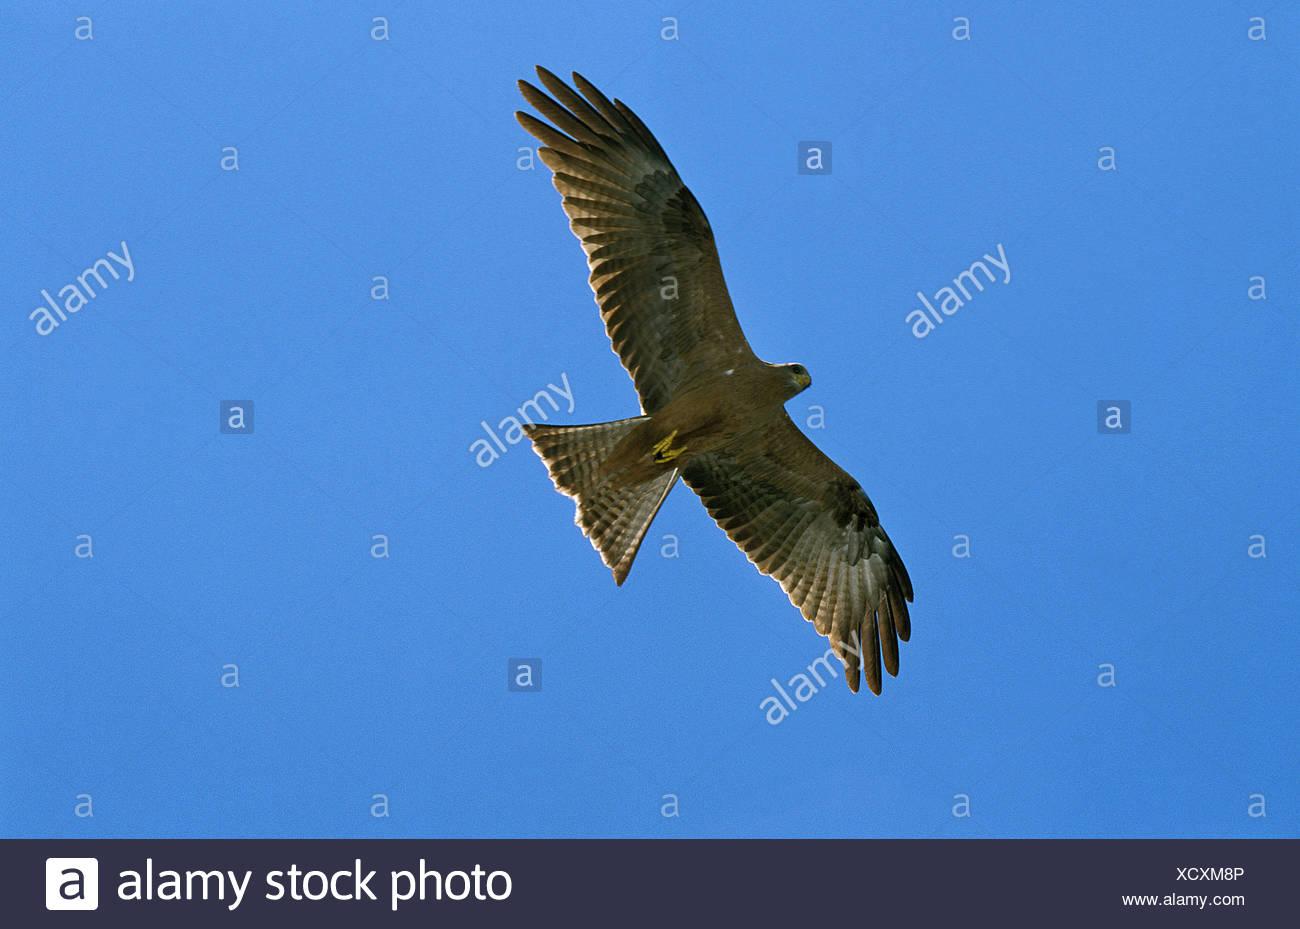 Black Kite, milvus migrans, Adult in flight against Blue Sky, Tanzanie - Stock Image